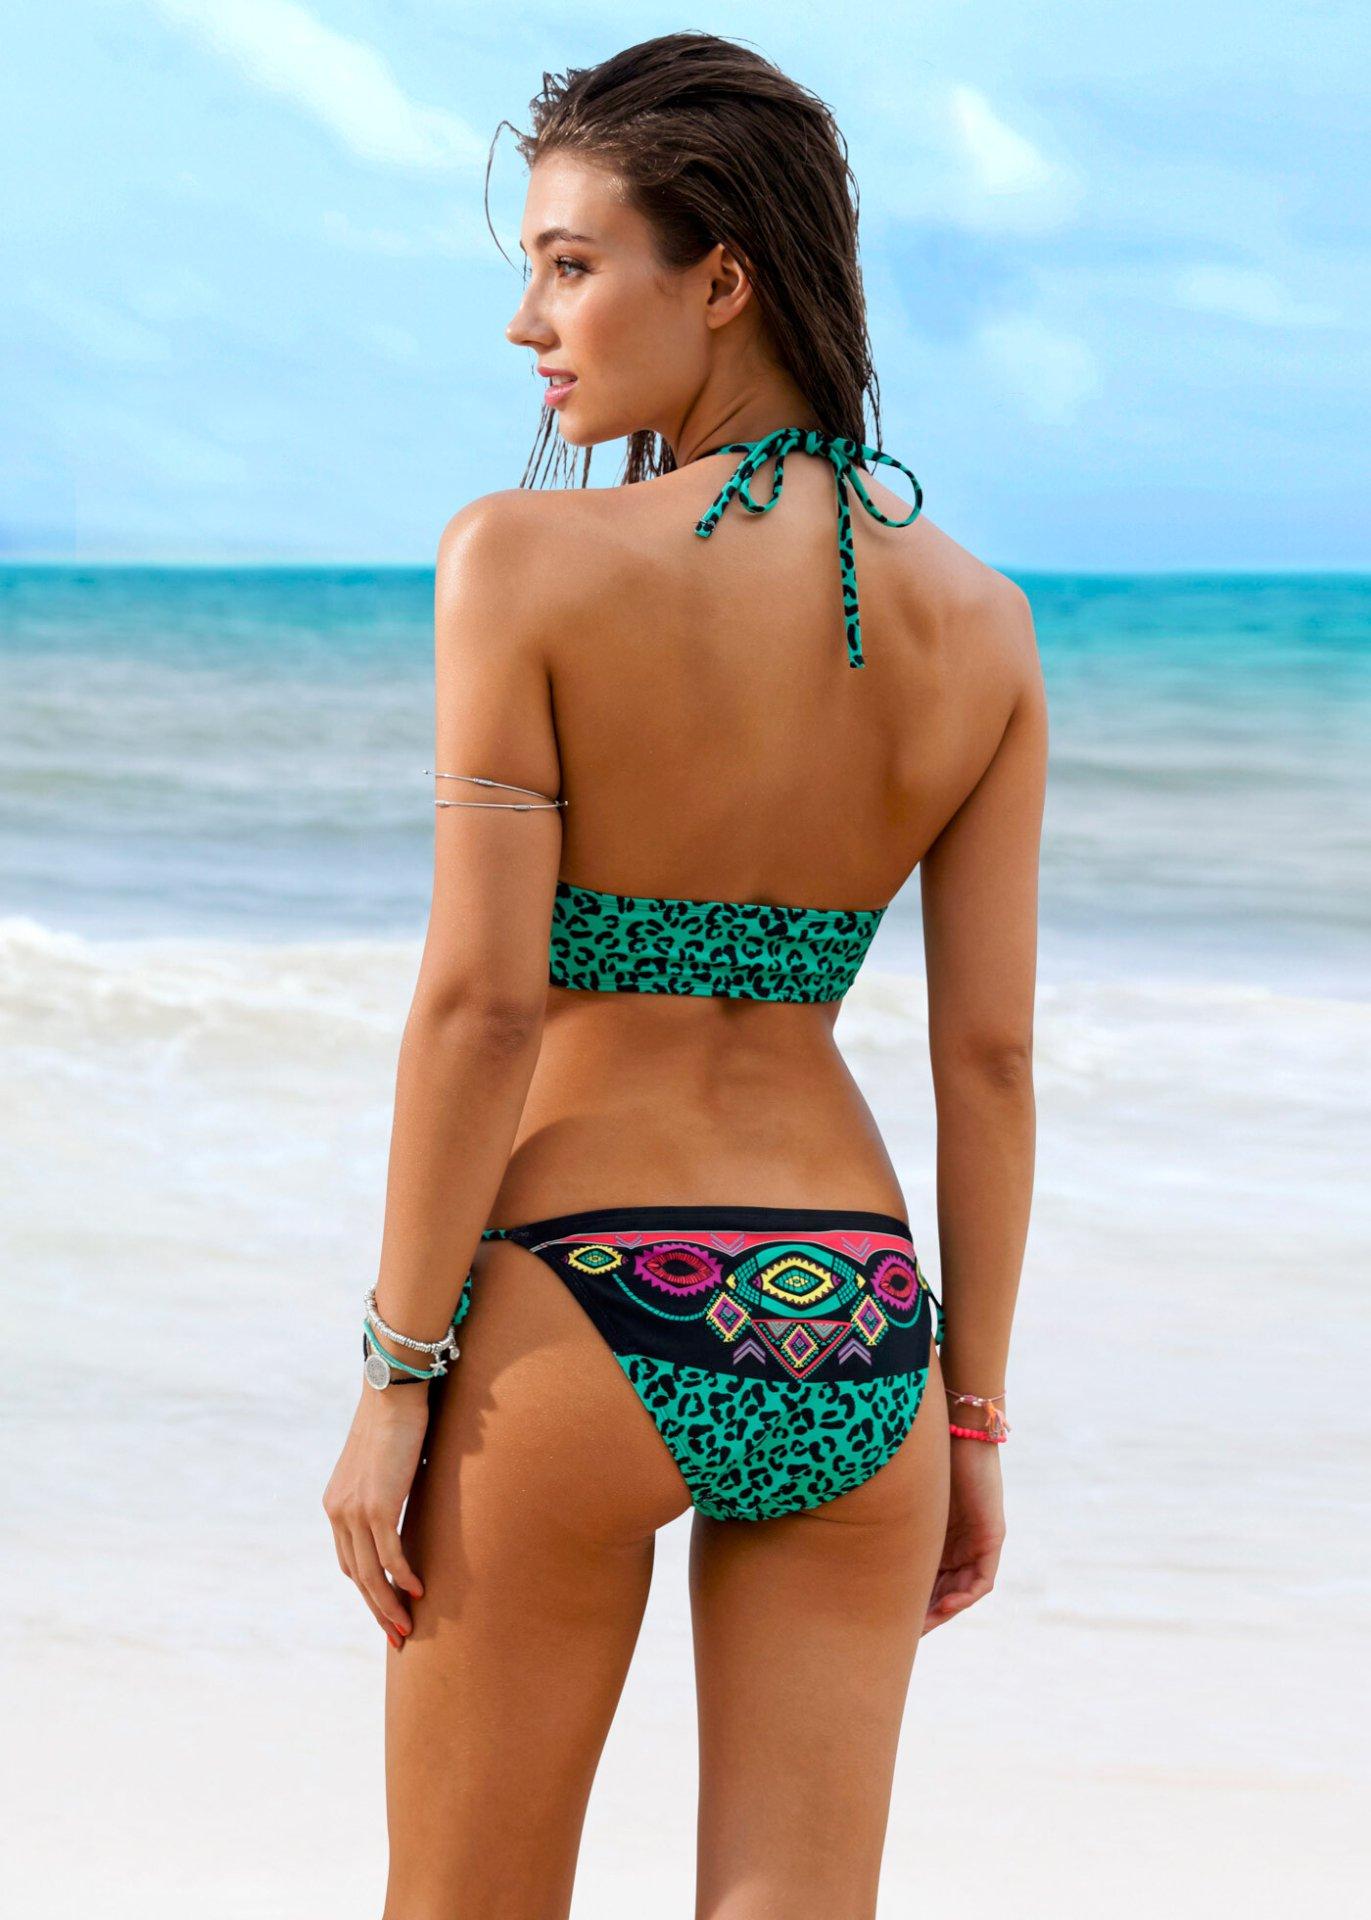 Lorena Rae Sexy Swimwear ()